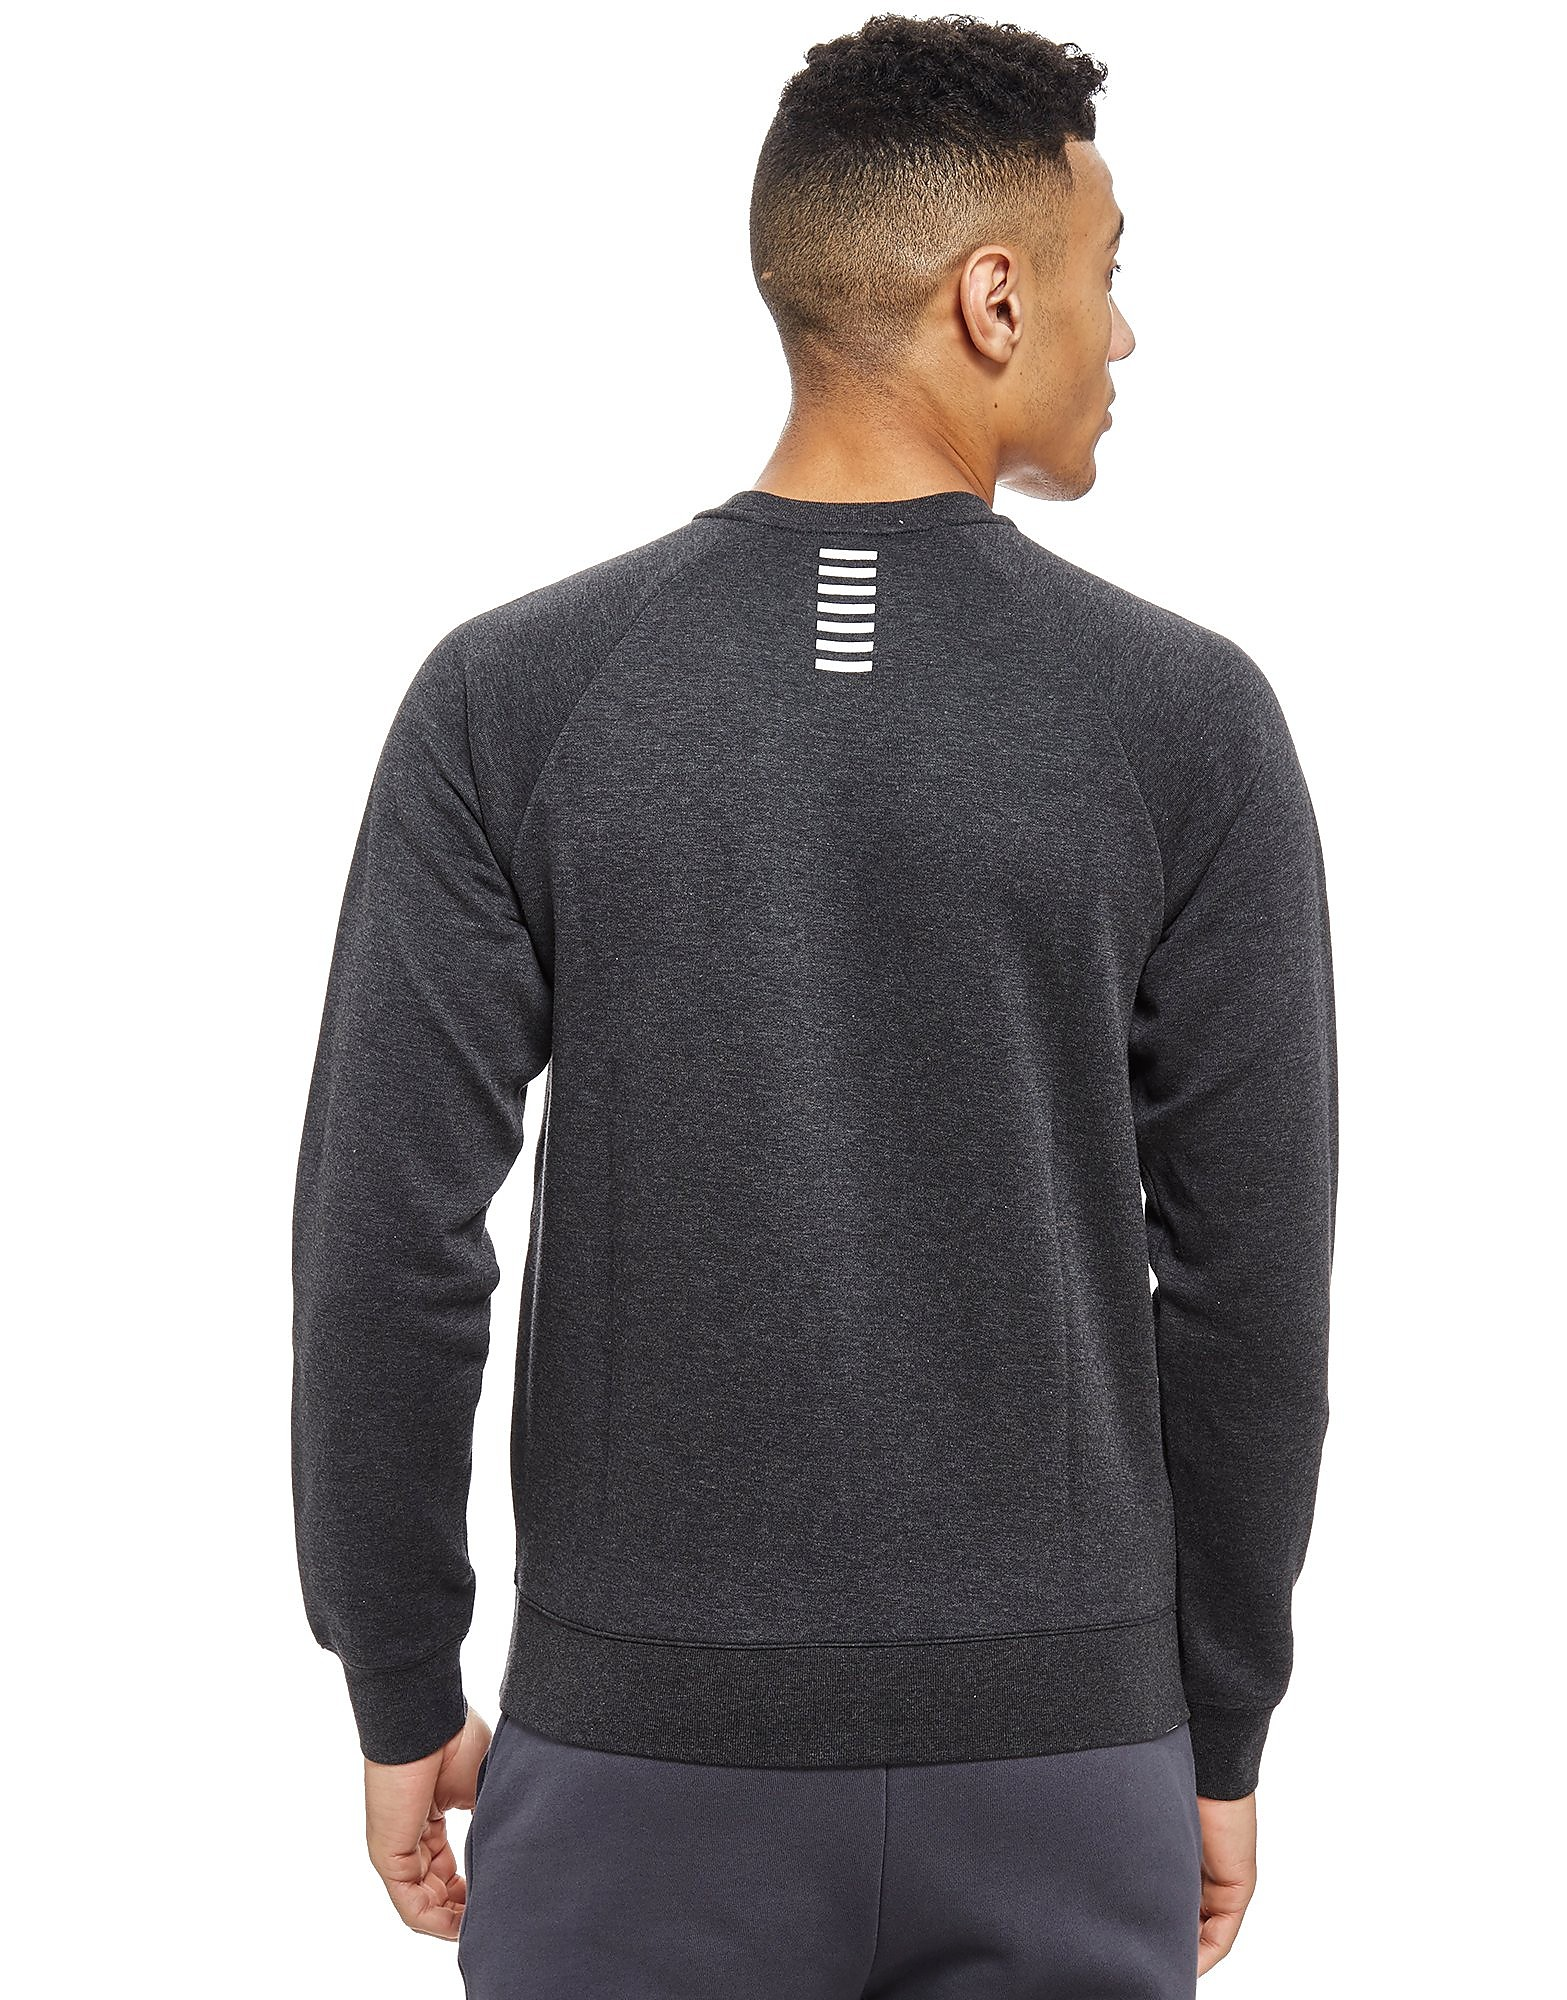 Emporio Armani EA7 Double Knit Crew Sweatshirt Heren